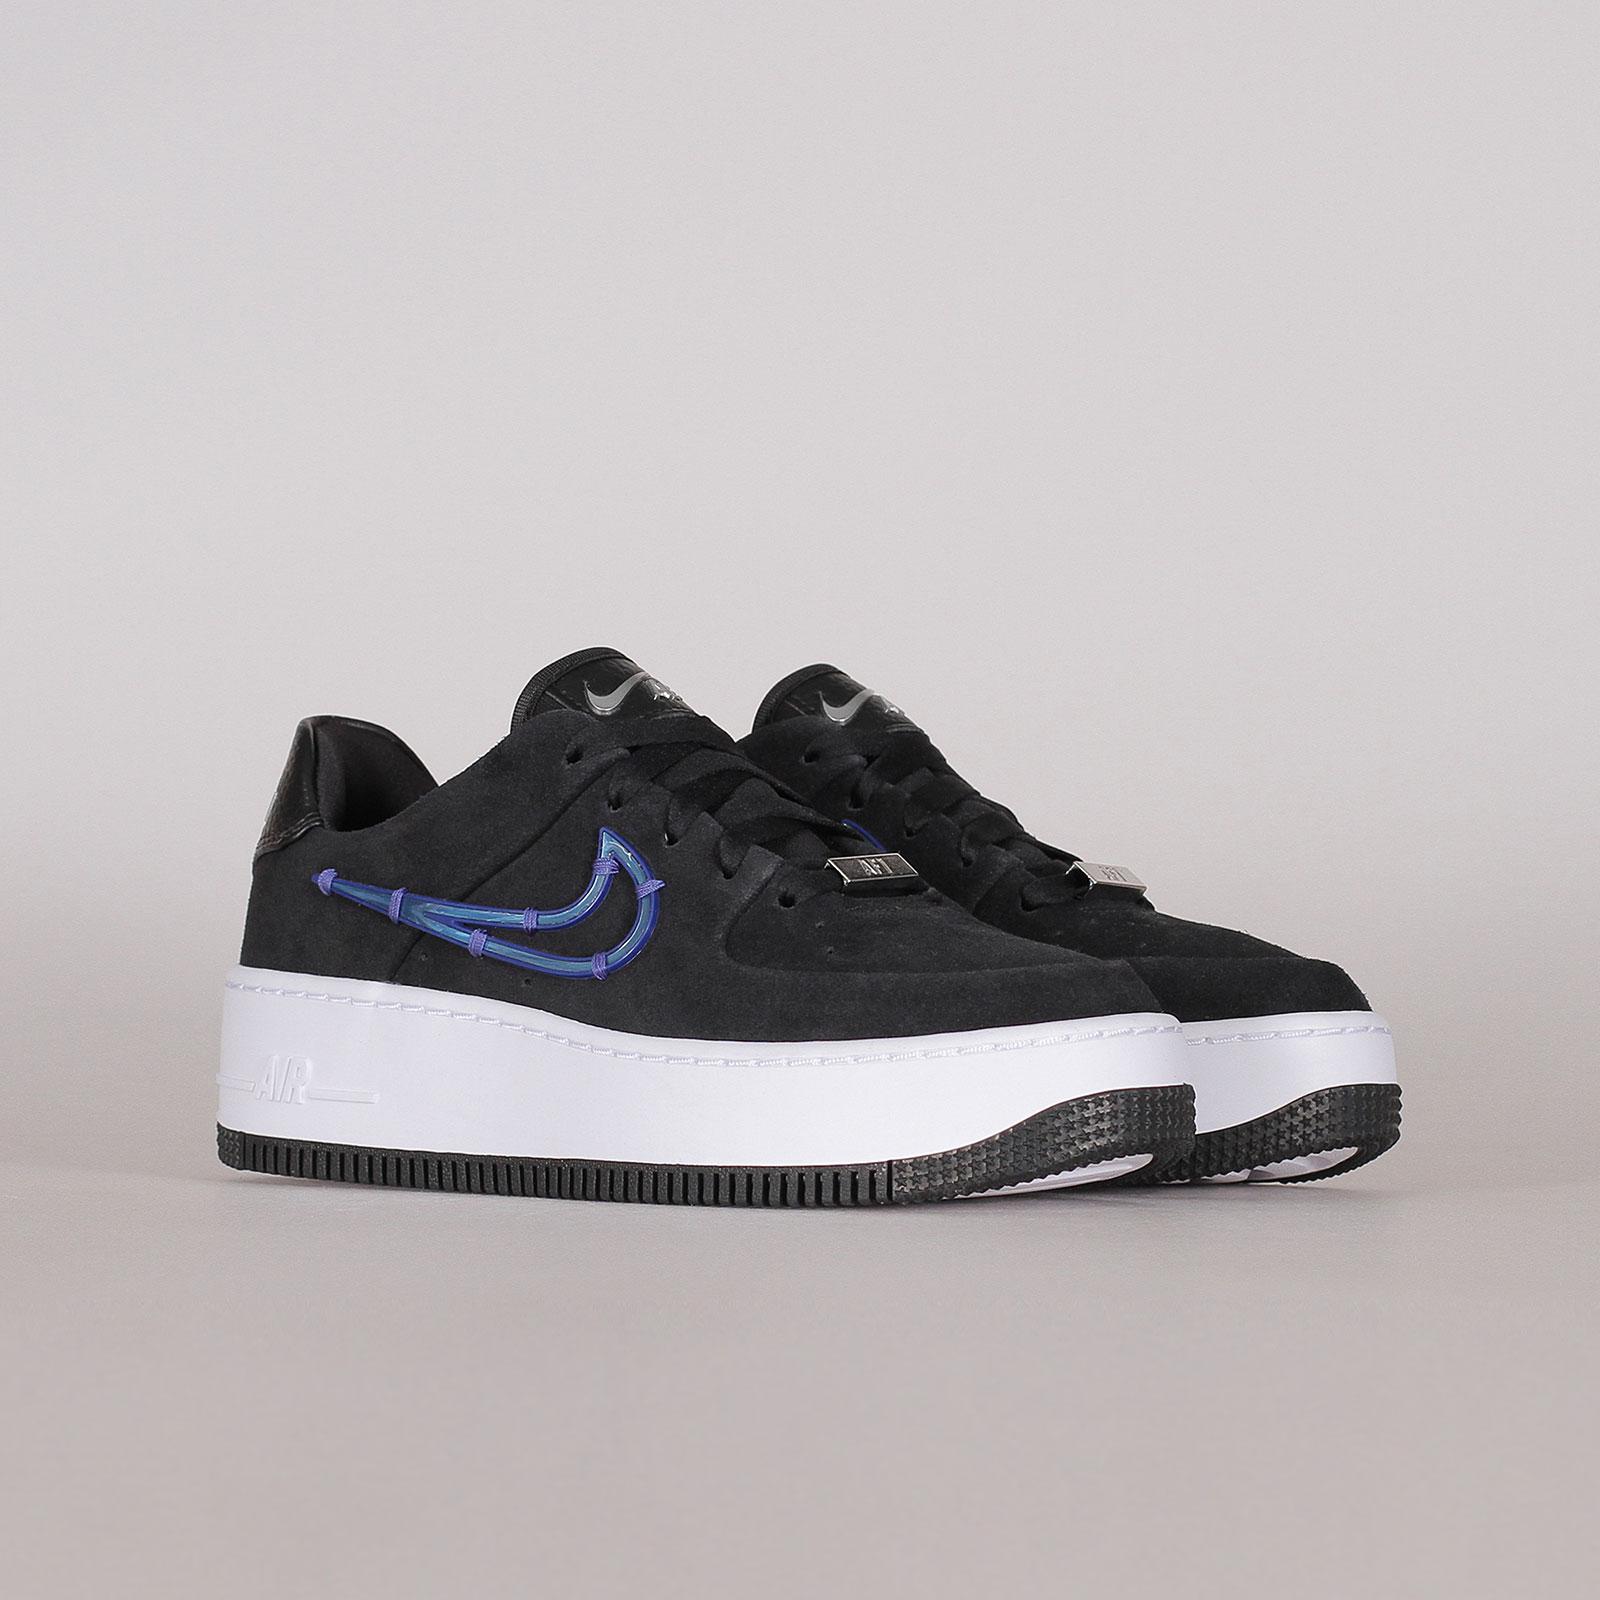 Nike Womens Air Force 1 Sage Low LX